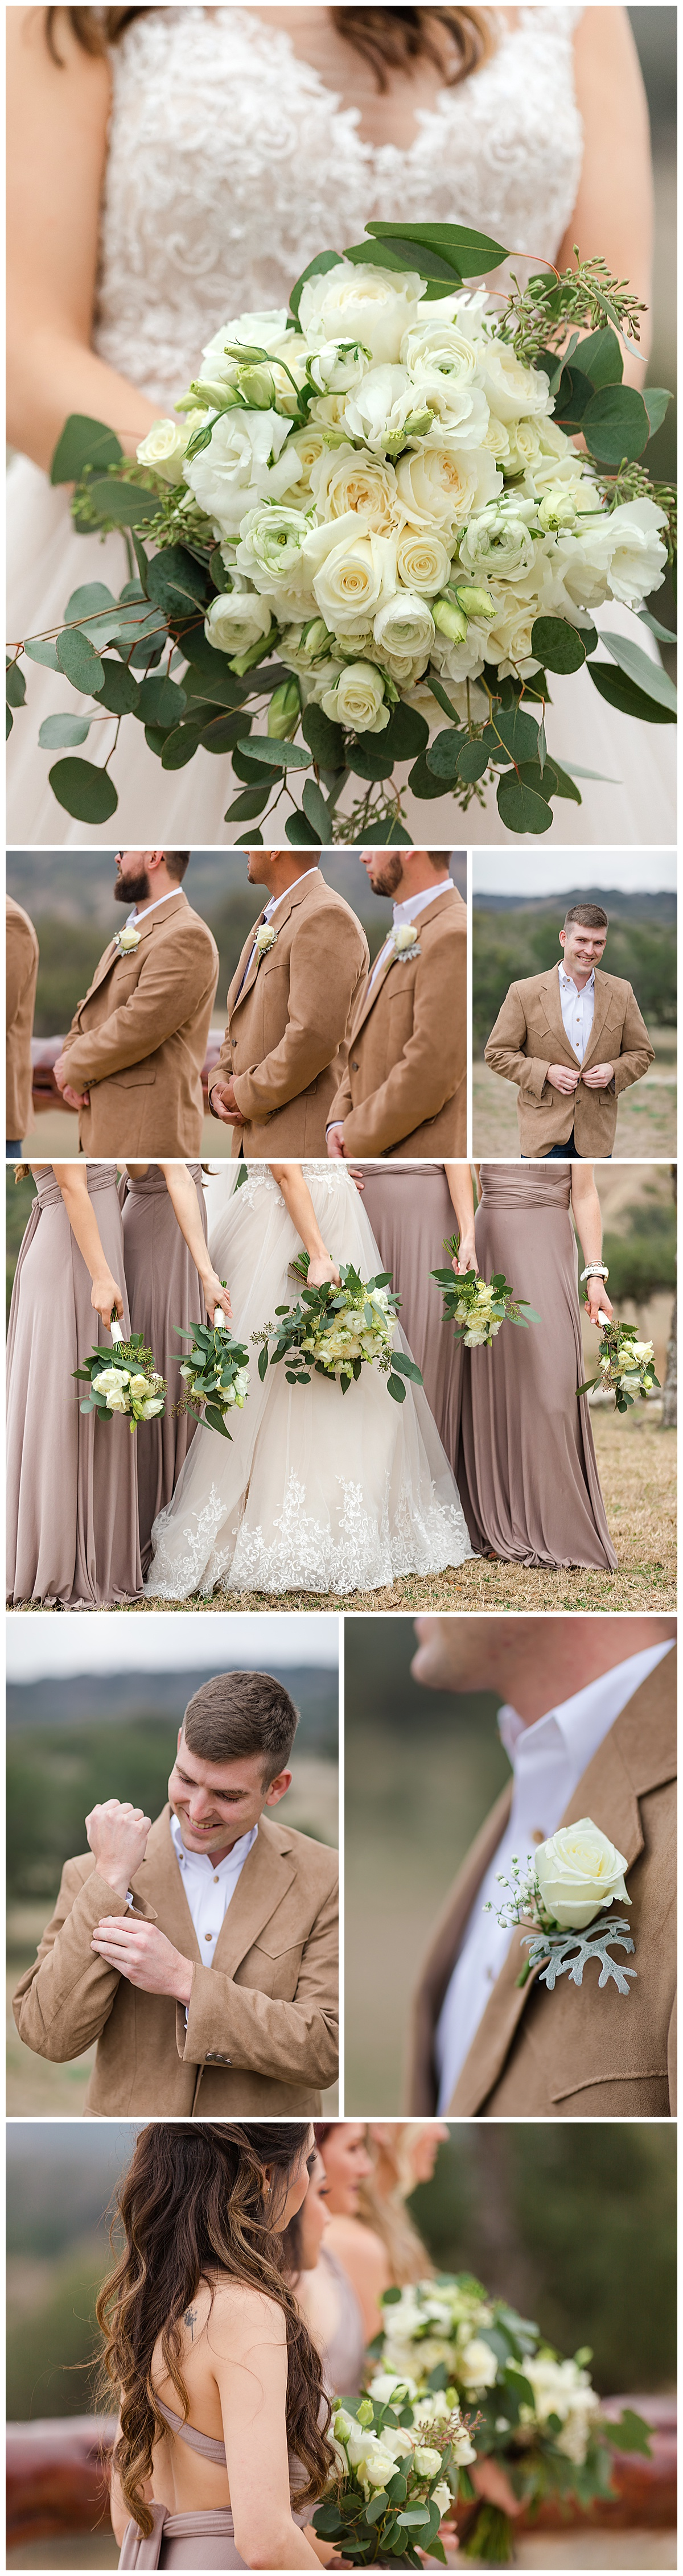 Wedding-Photographer-Texas-Hill-Country-Happy-H-Ranch-Comfor-Texas-Carly-Barton-Photography_0007.jpg